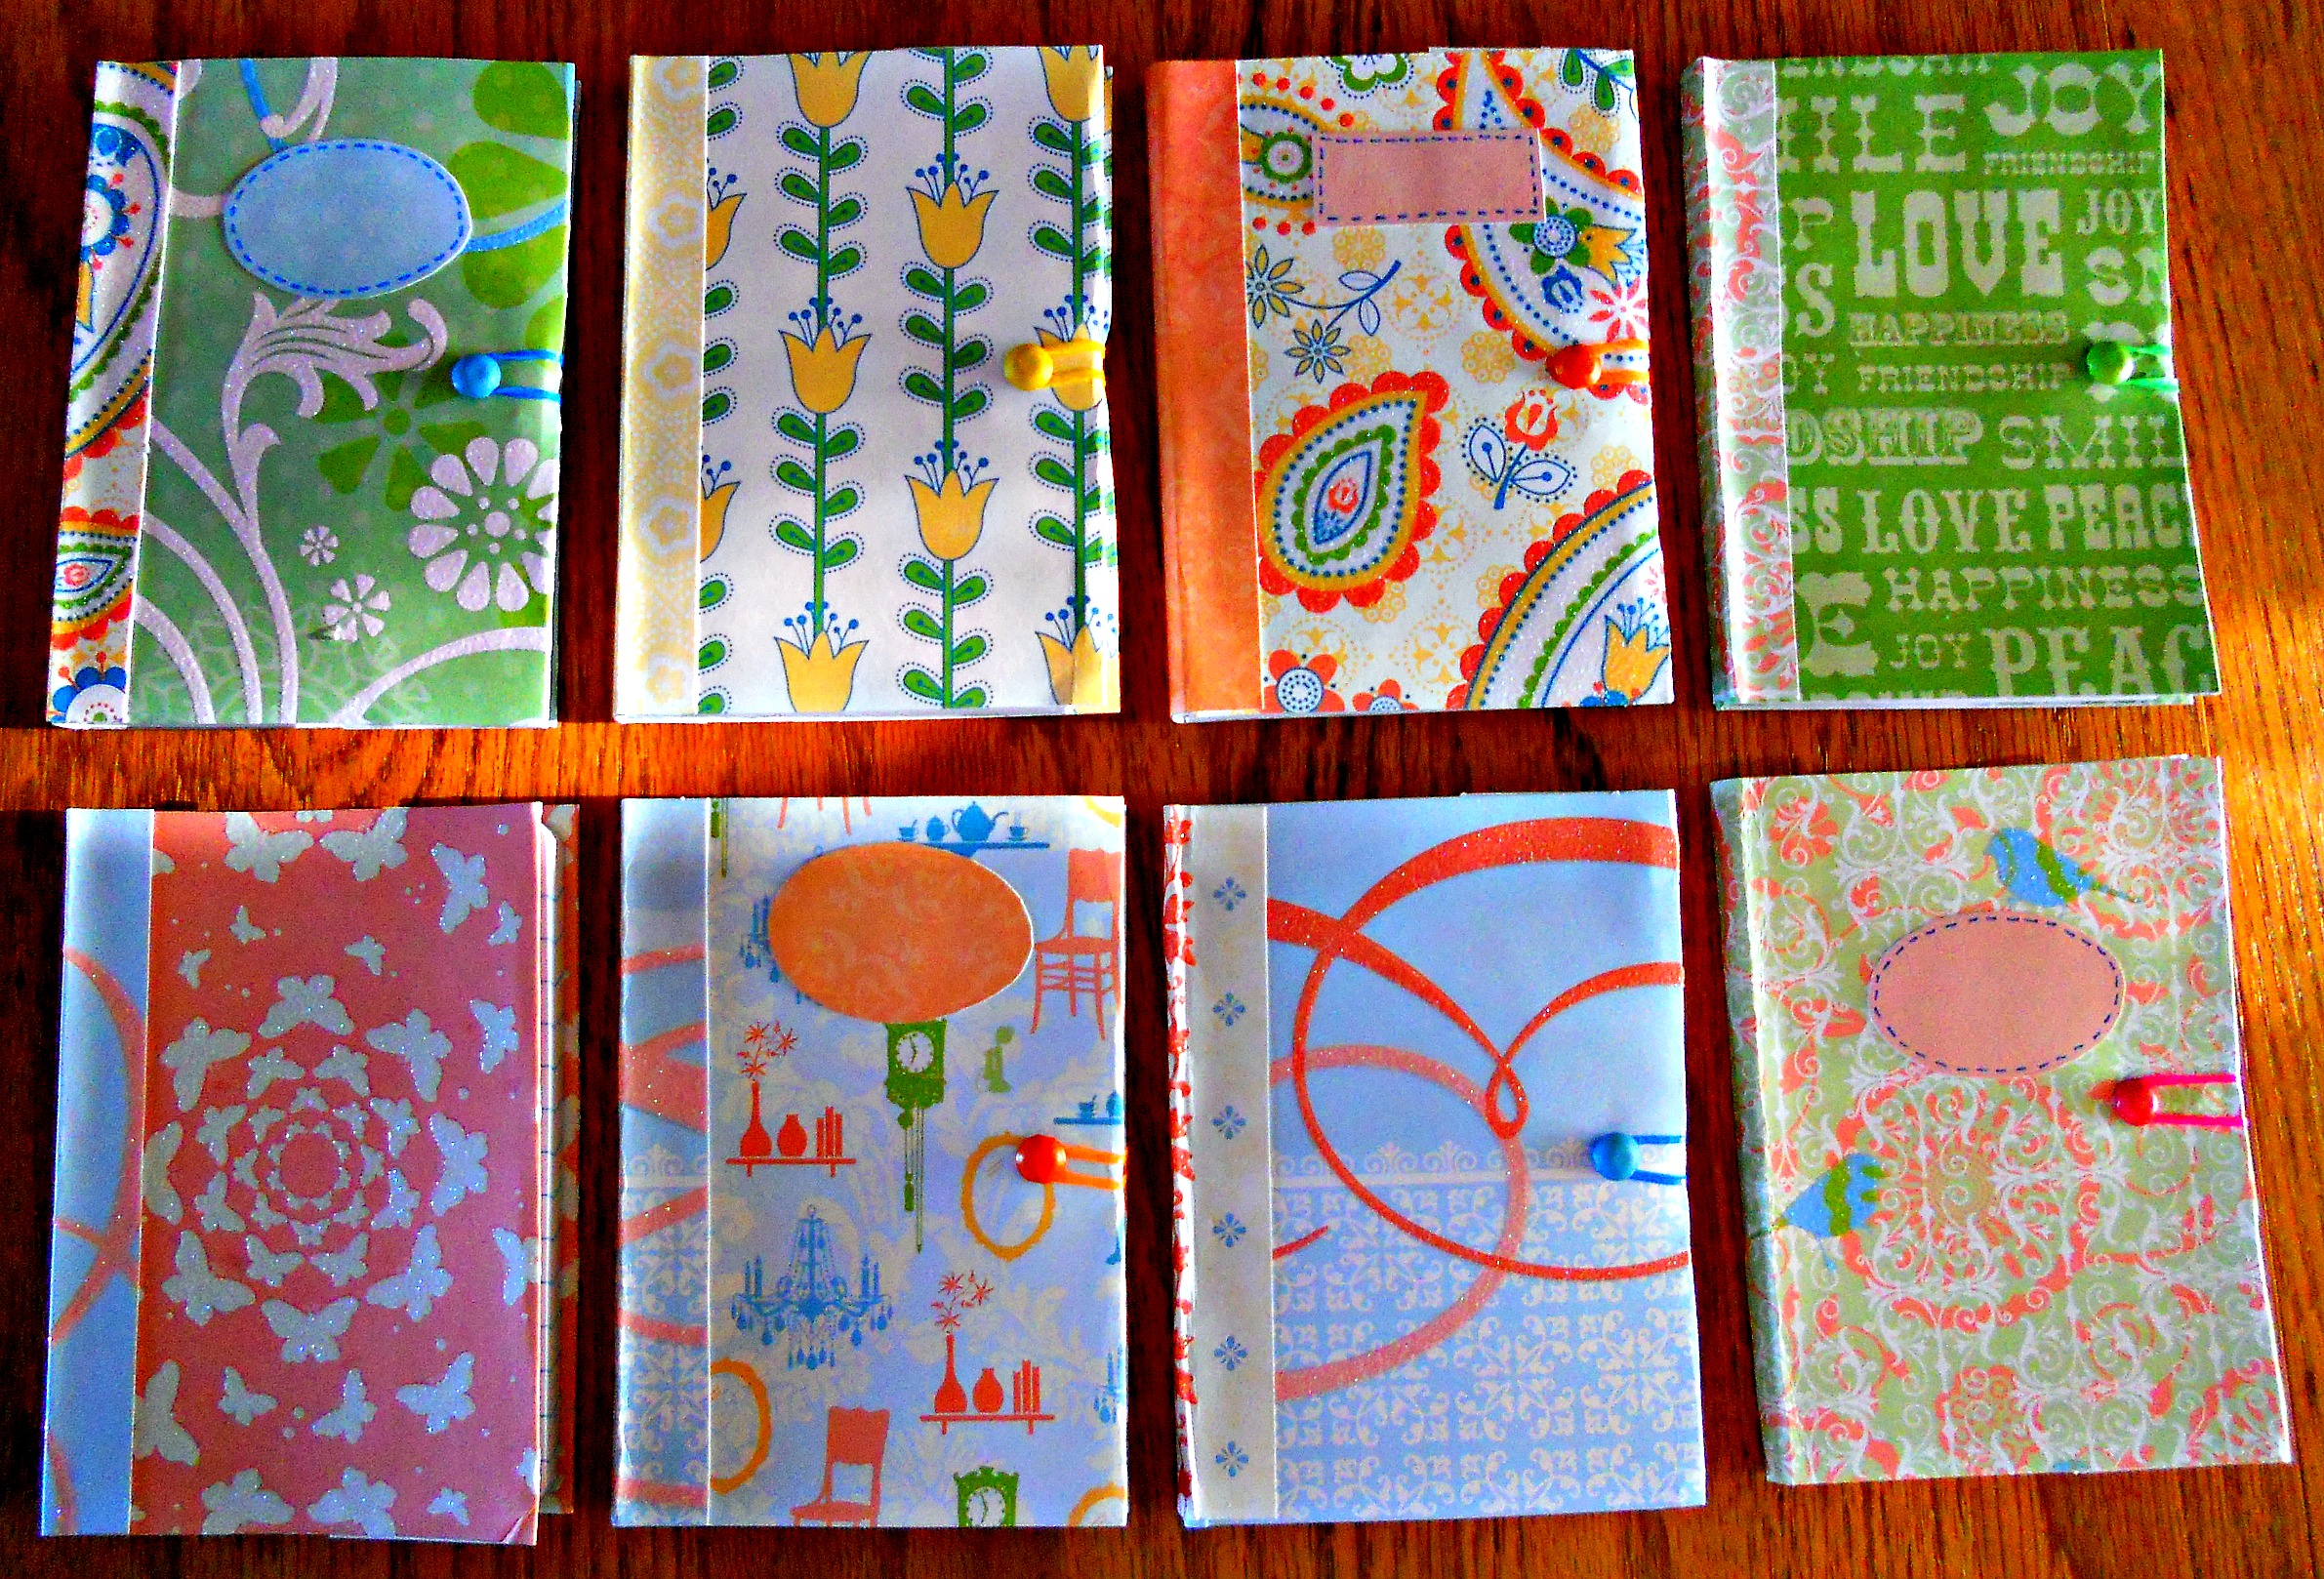 Scrapbook notebook ideas - Scrapbook Notebook Ideas Homemade Gifts Pillows A La Mode